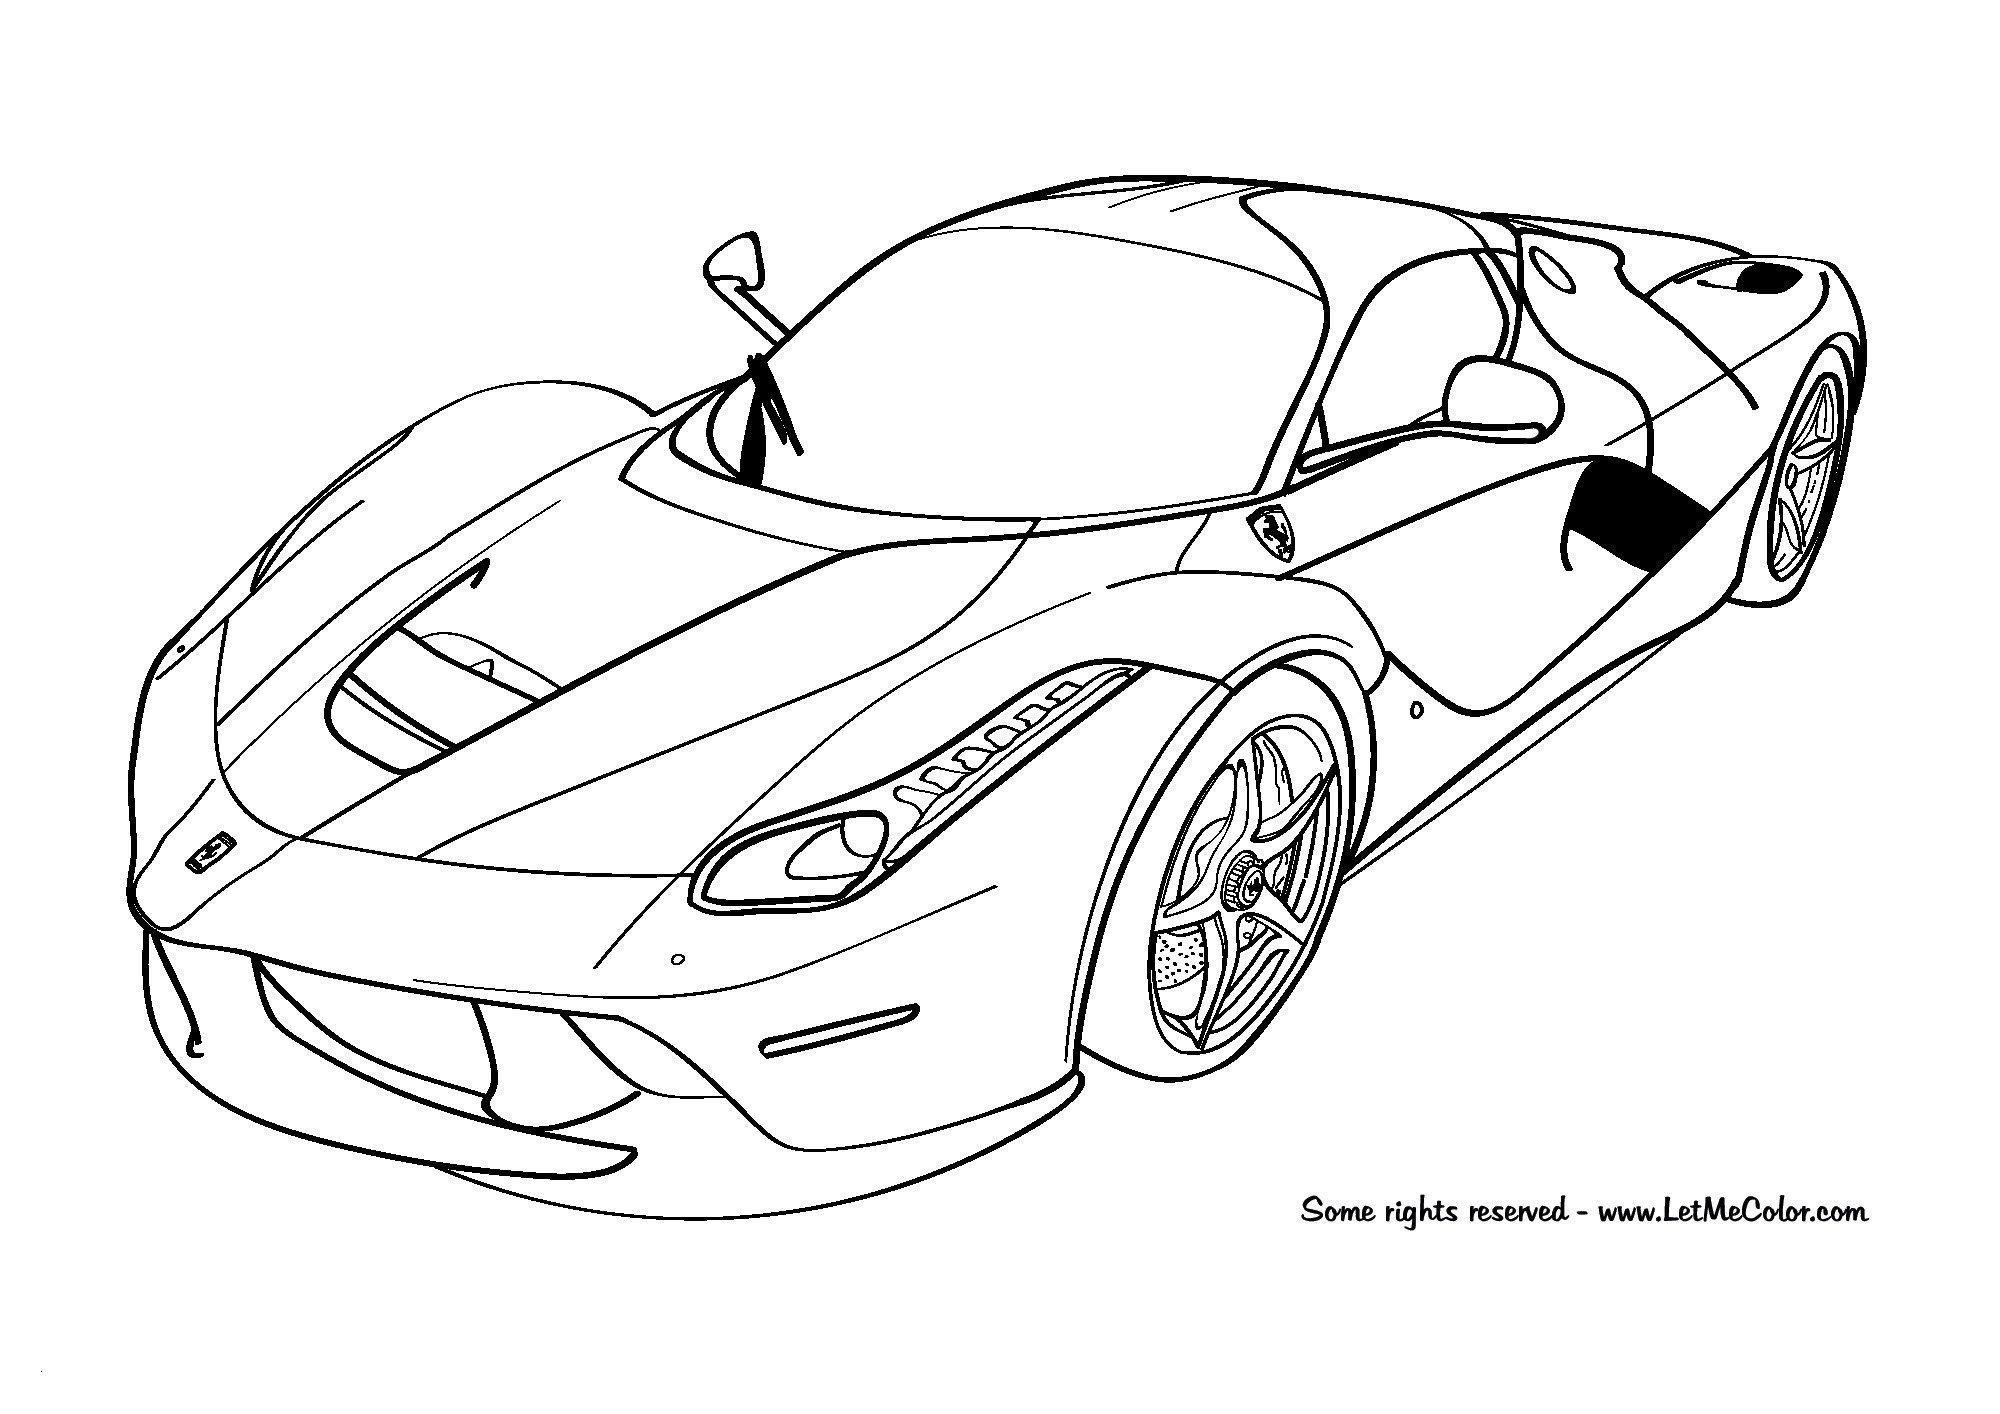 Bildergebnis für malbild auto in 10  Ferrari laferrari